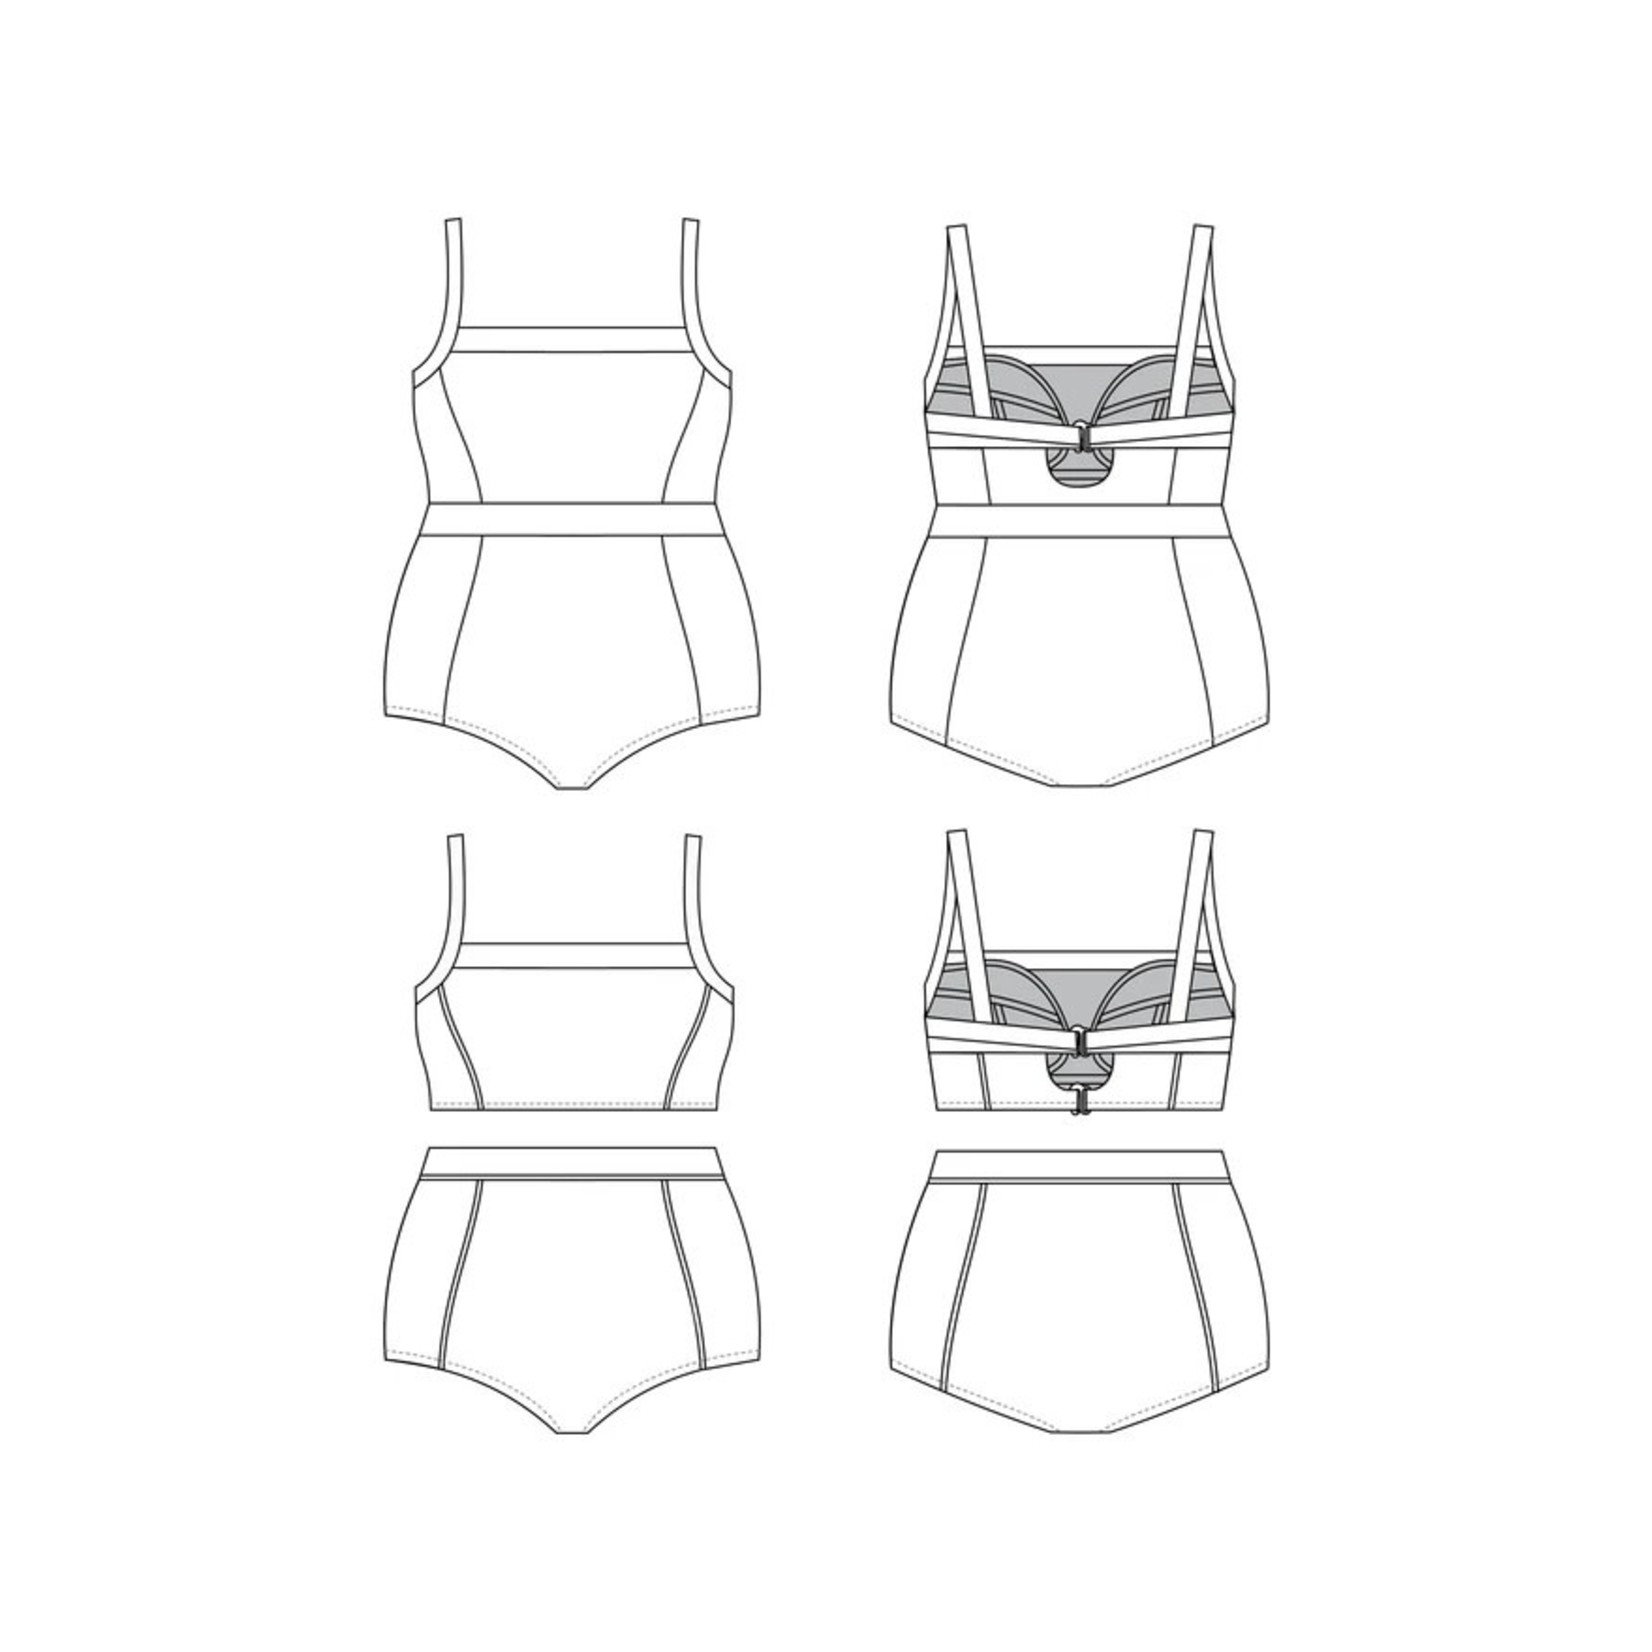 Cashmerette Ipswich Swimsuit One-Piece & Bikini Pattern 12-28 (Cup C-H)